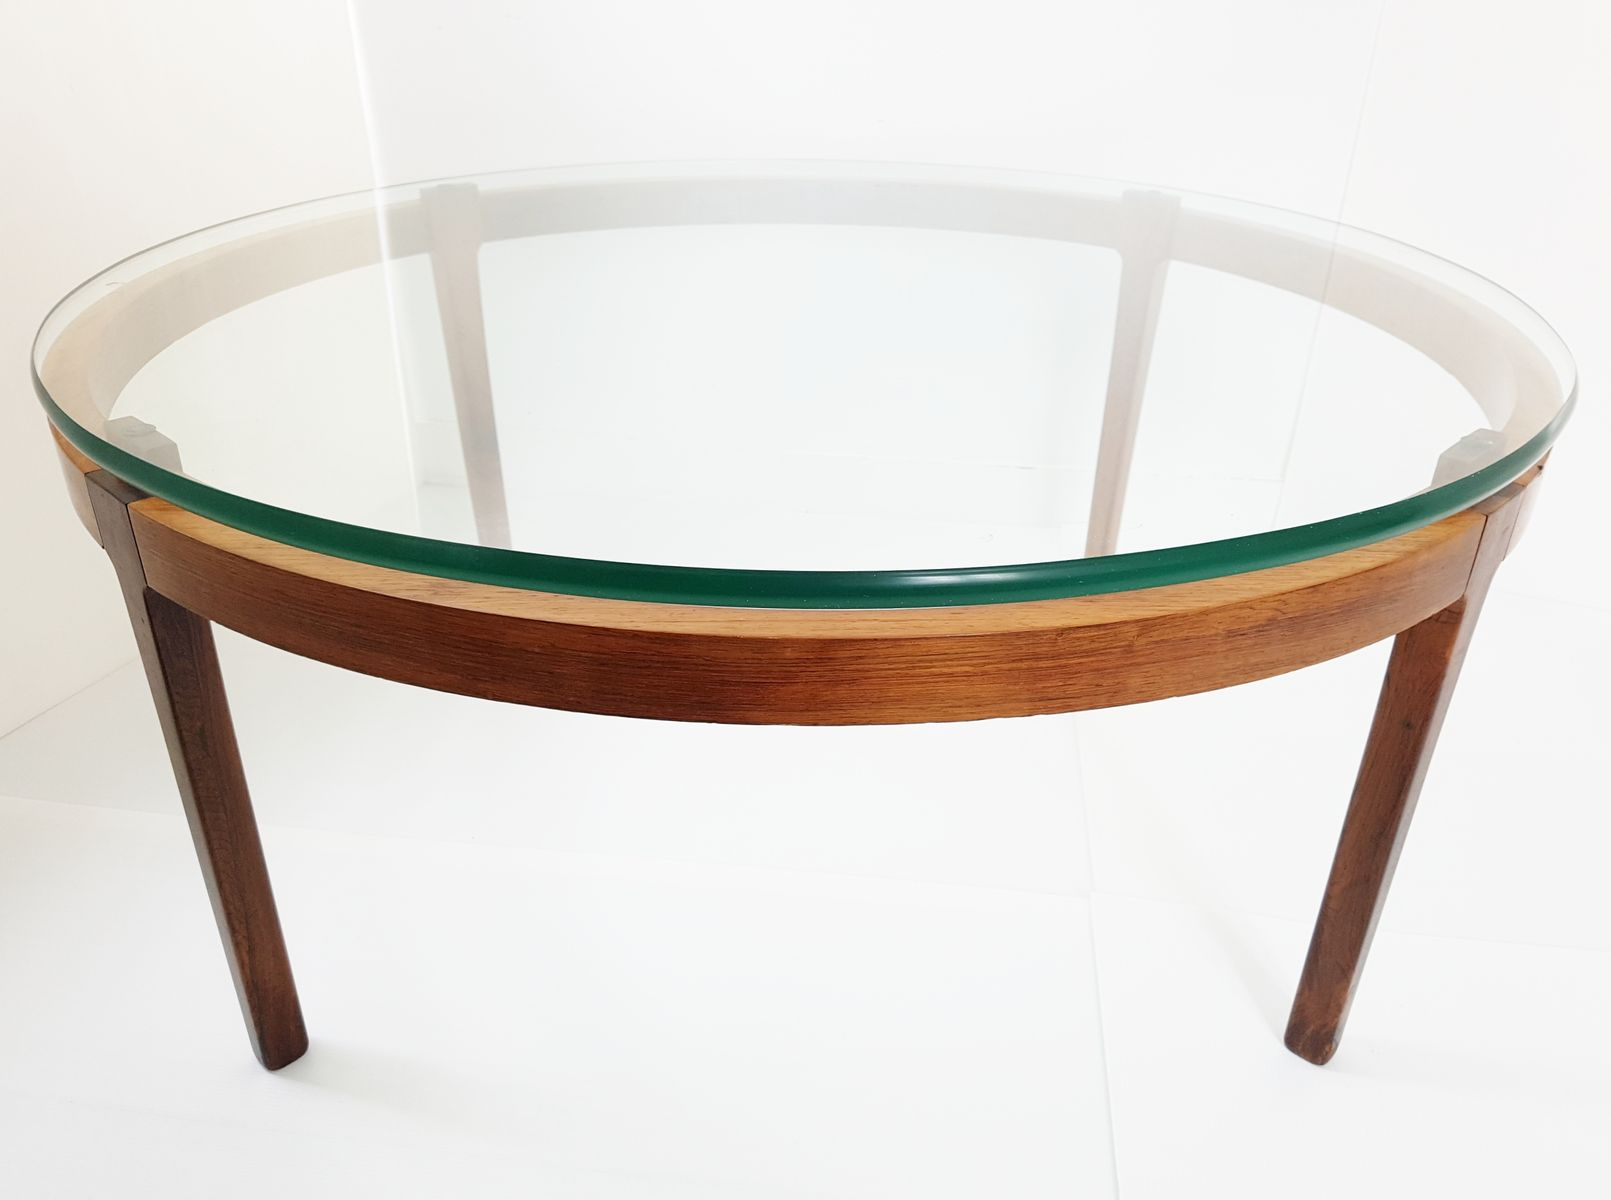 Mid century scandinavian teak rosewood round coffee table 1960s 11 1 20000 €